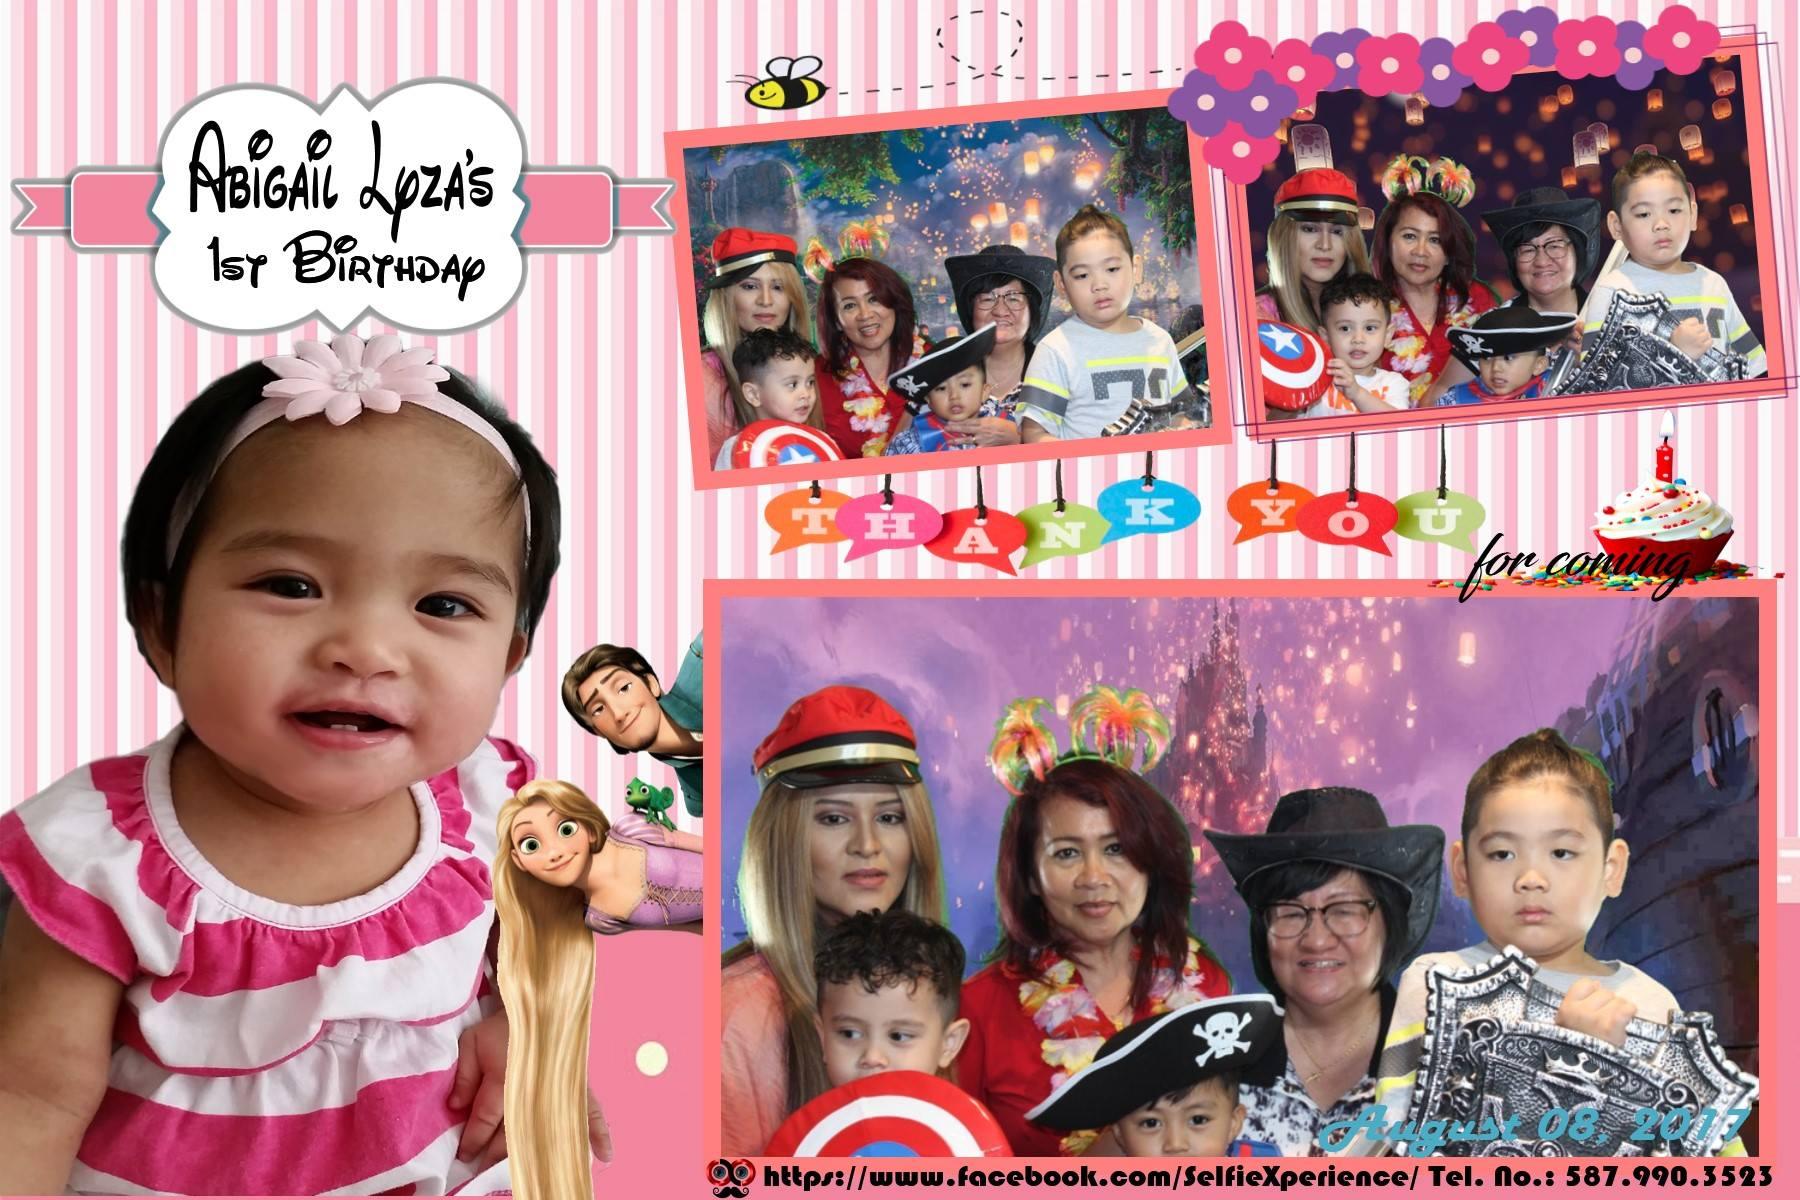 Abigail Laiza's Birthday